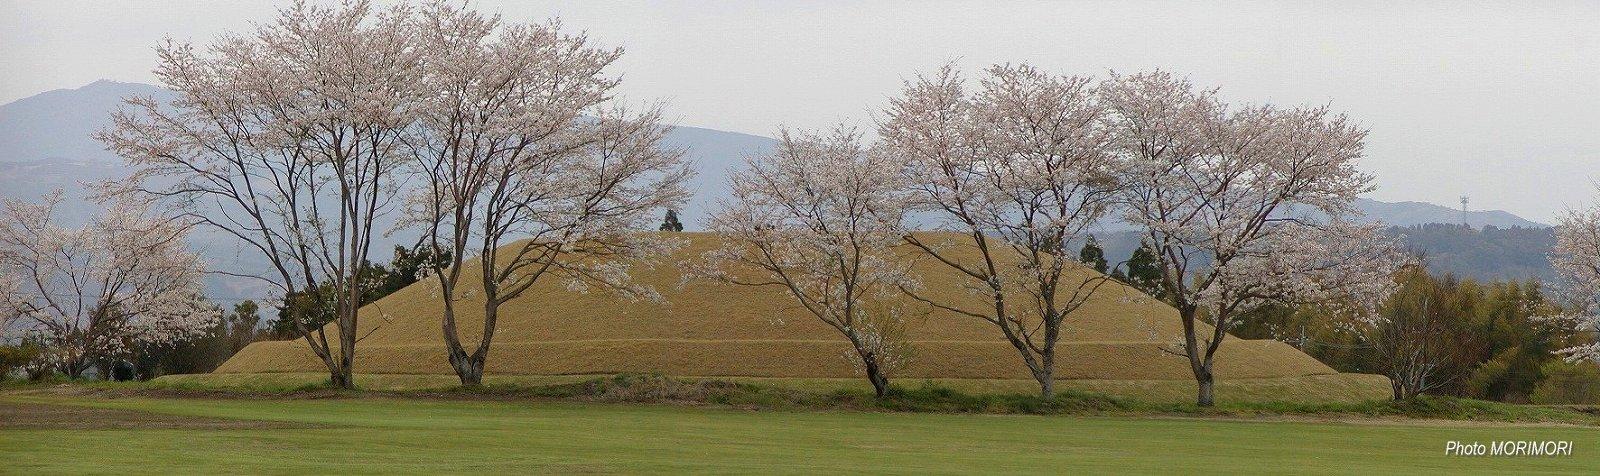 西都原古墳群 169号墳 パノラマ写真